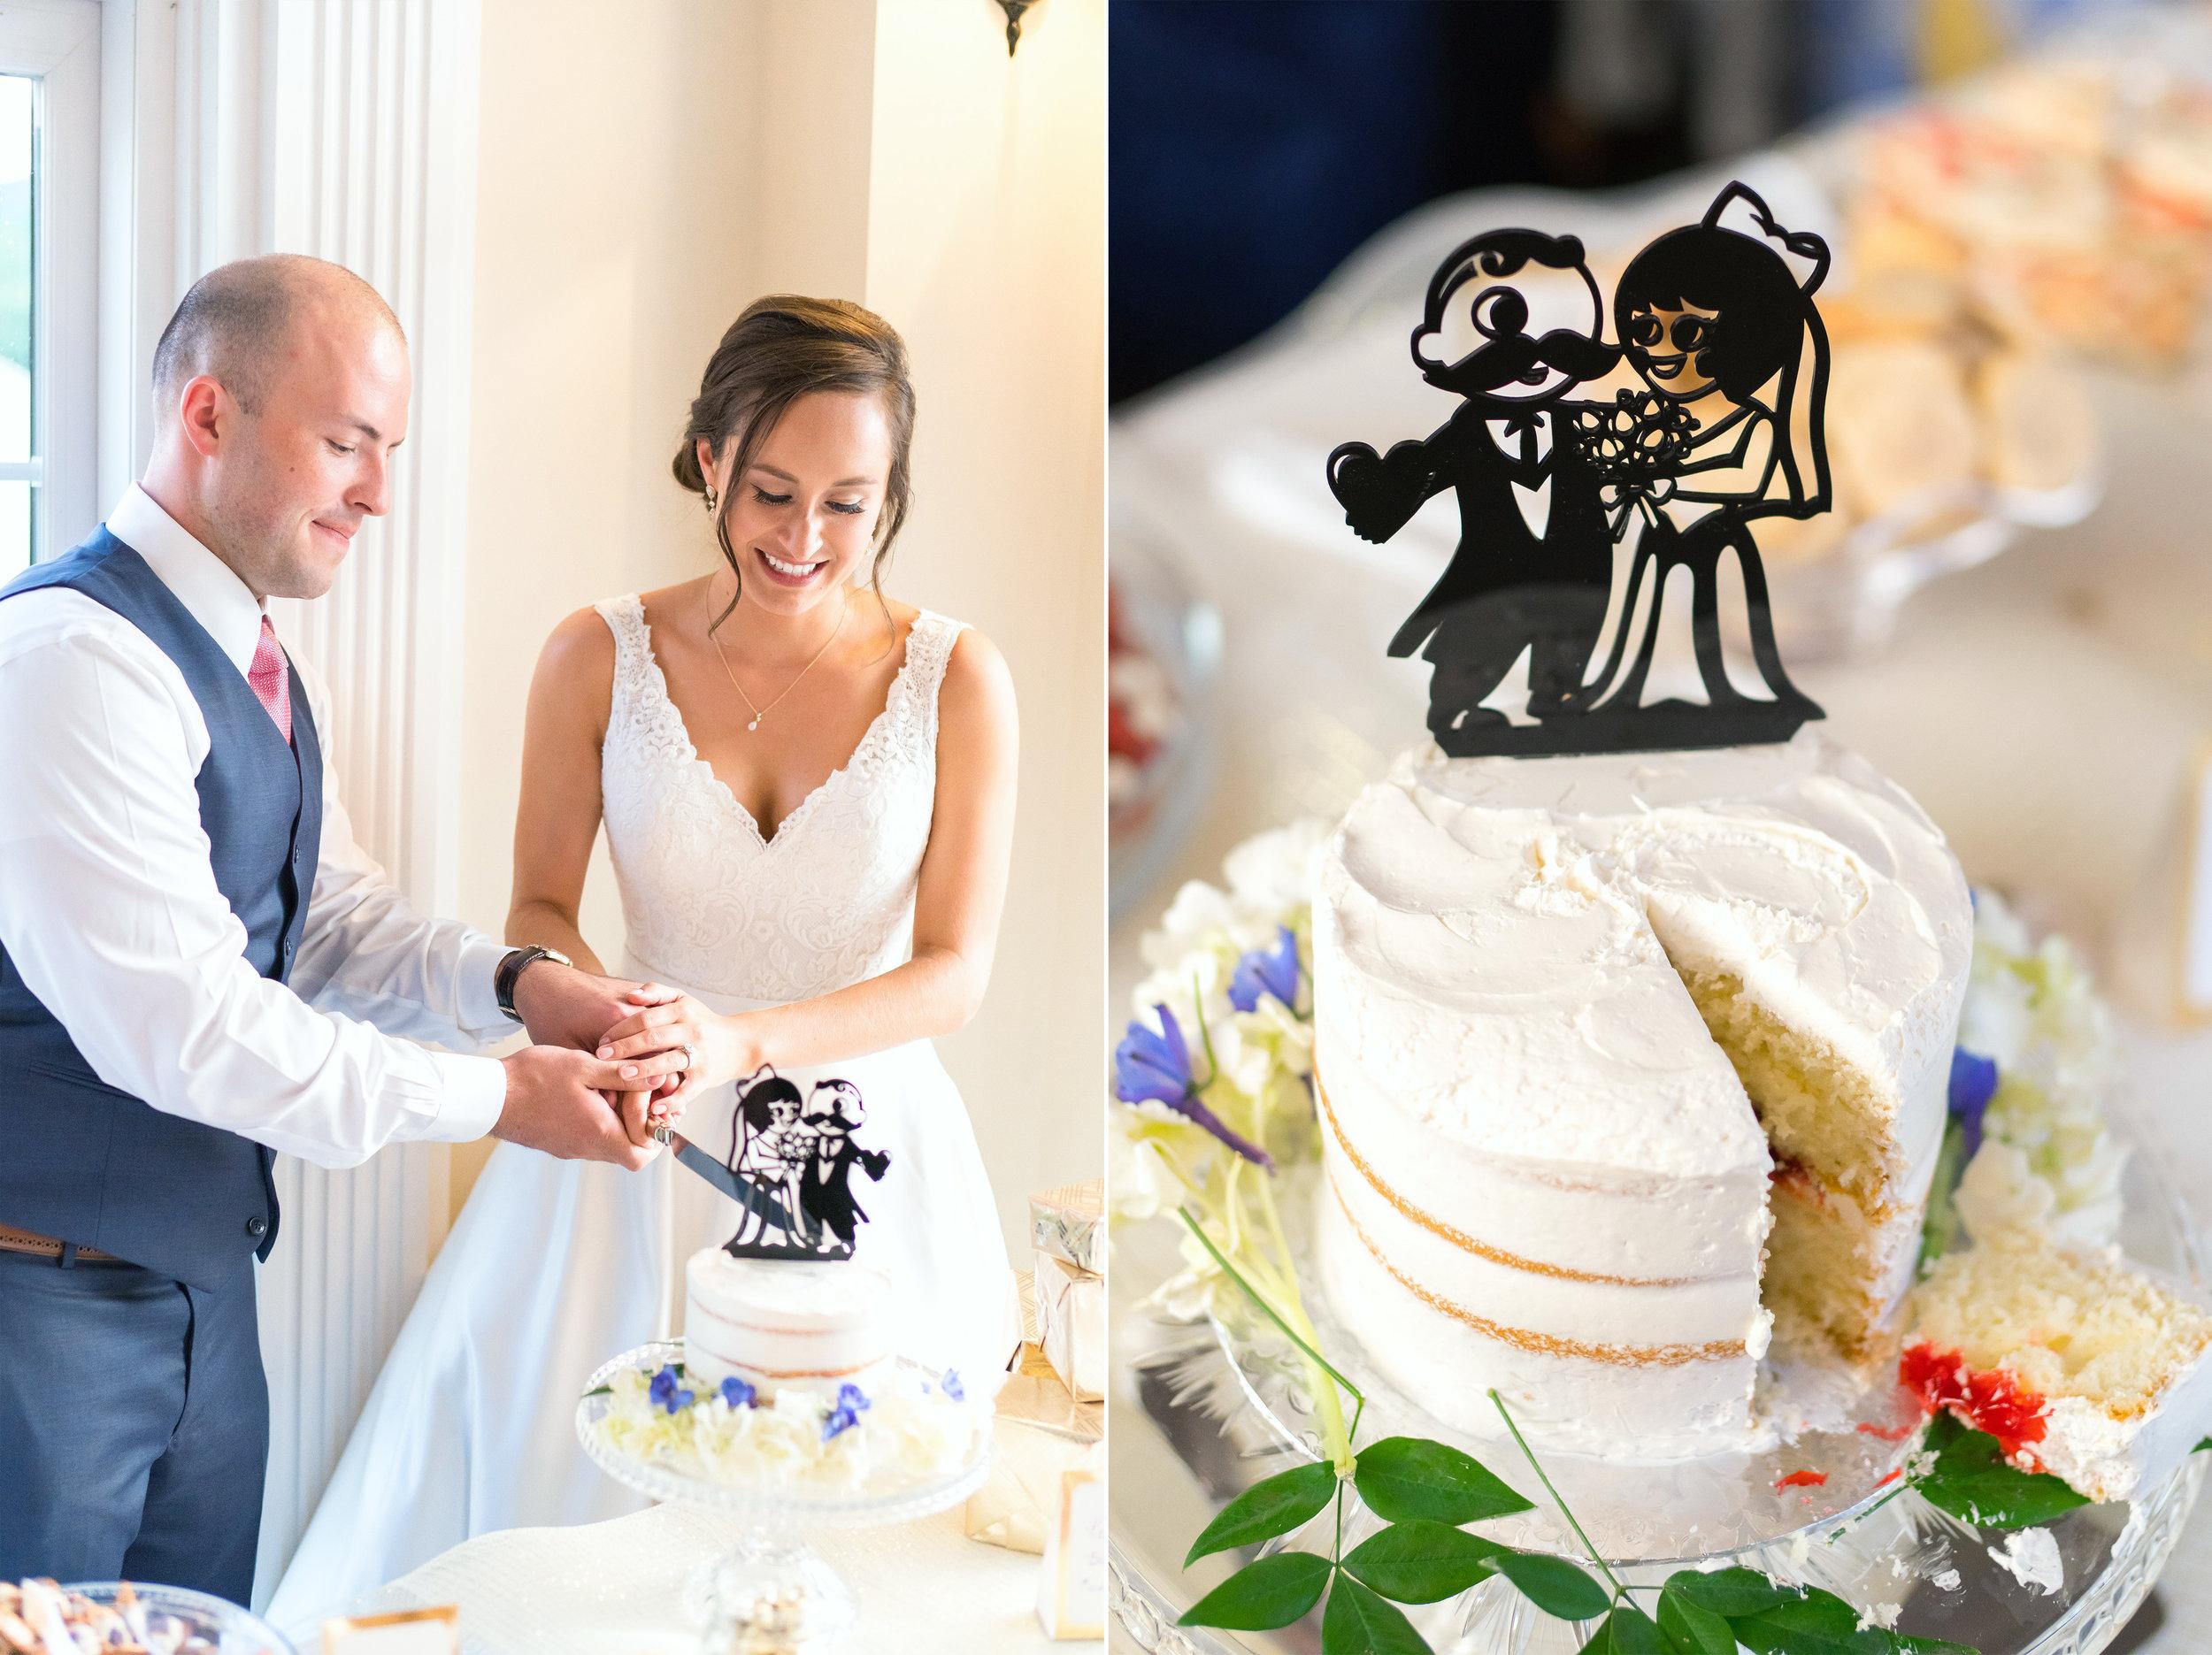 Cake cutting at beautiful maryland wedding venue